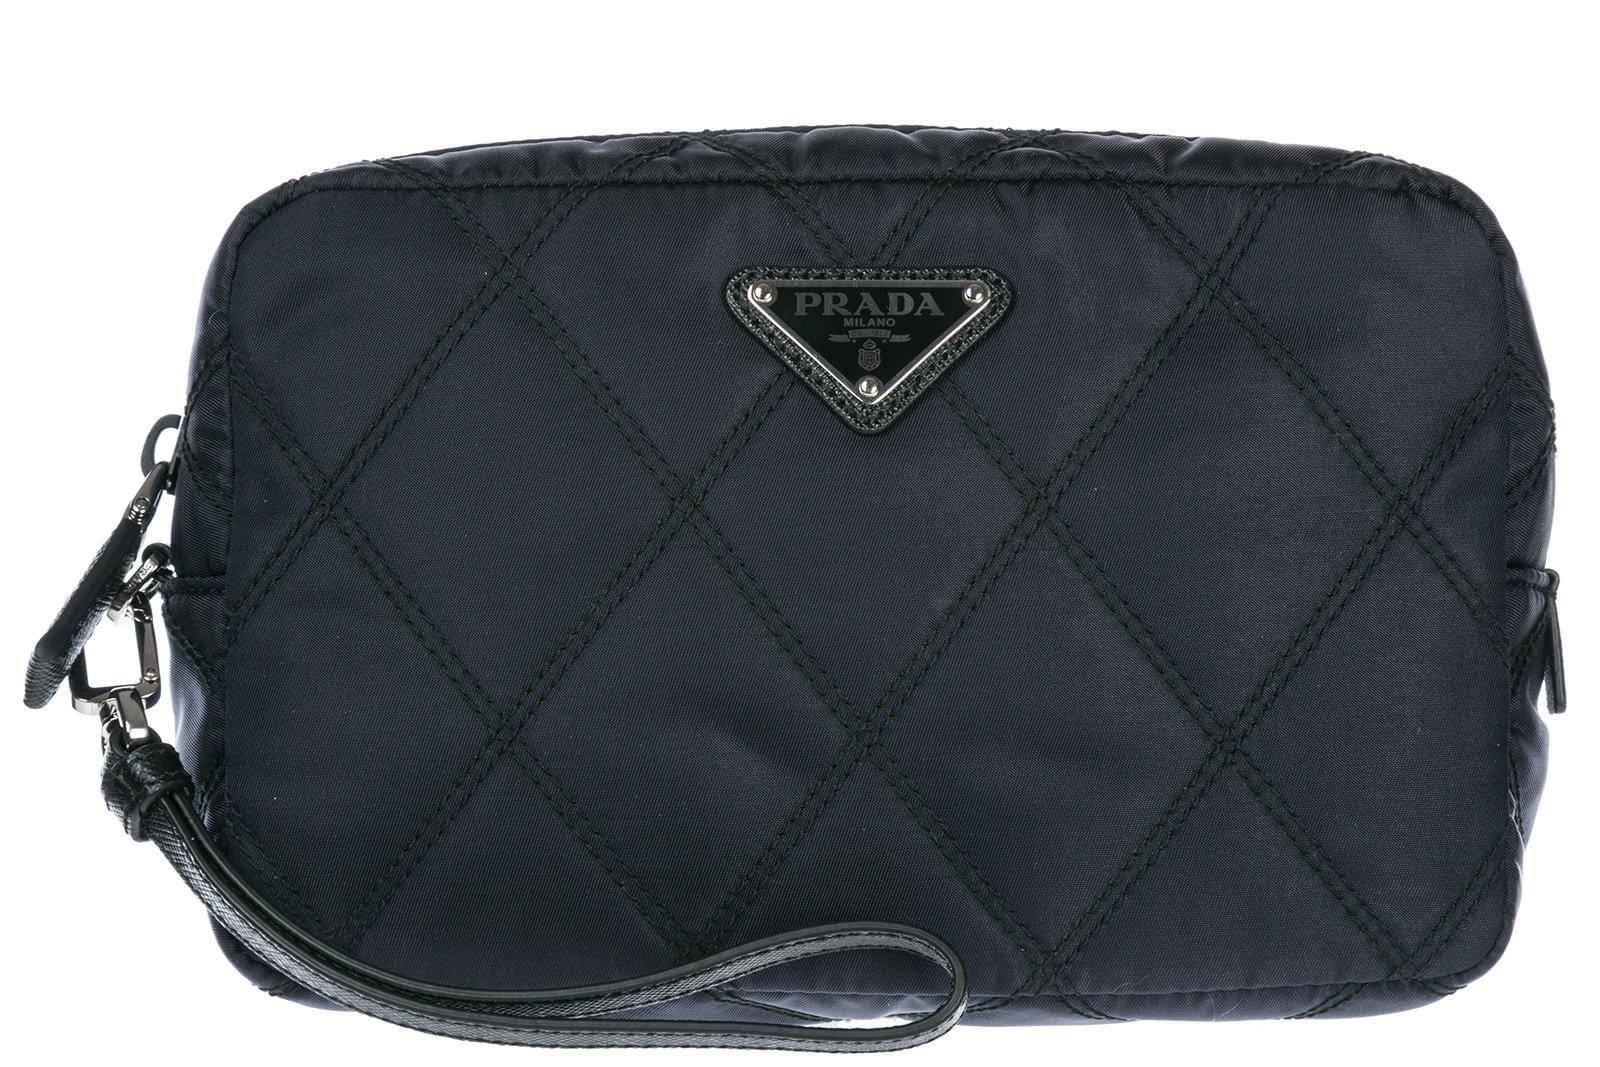 Prada women's travel makeup beauty case in Nylon blu